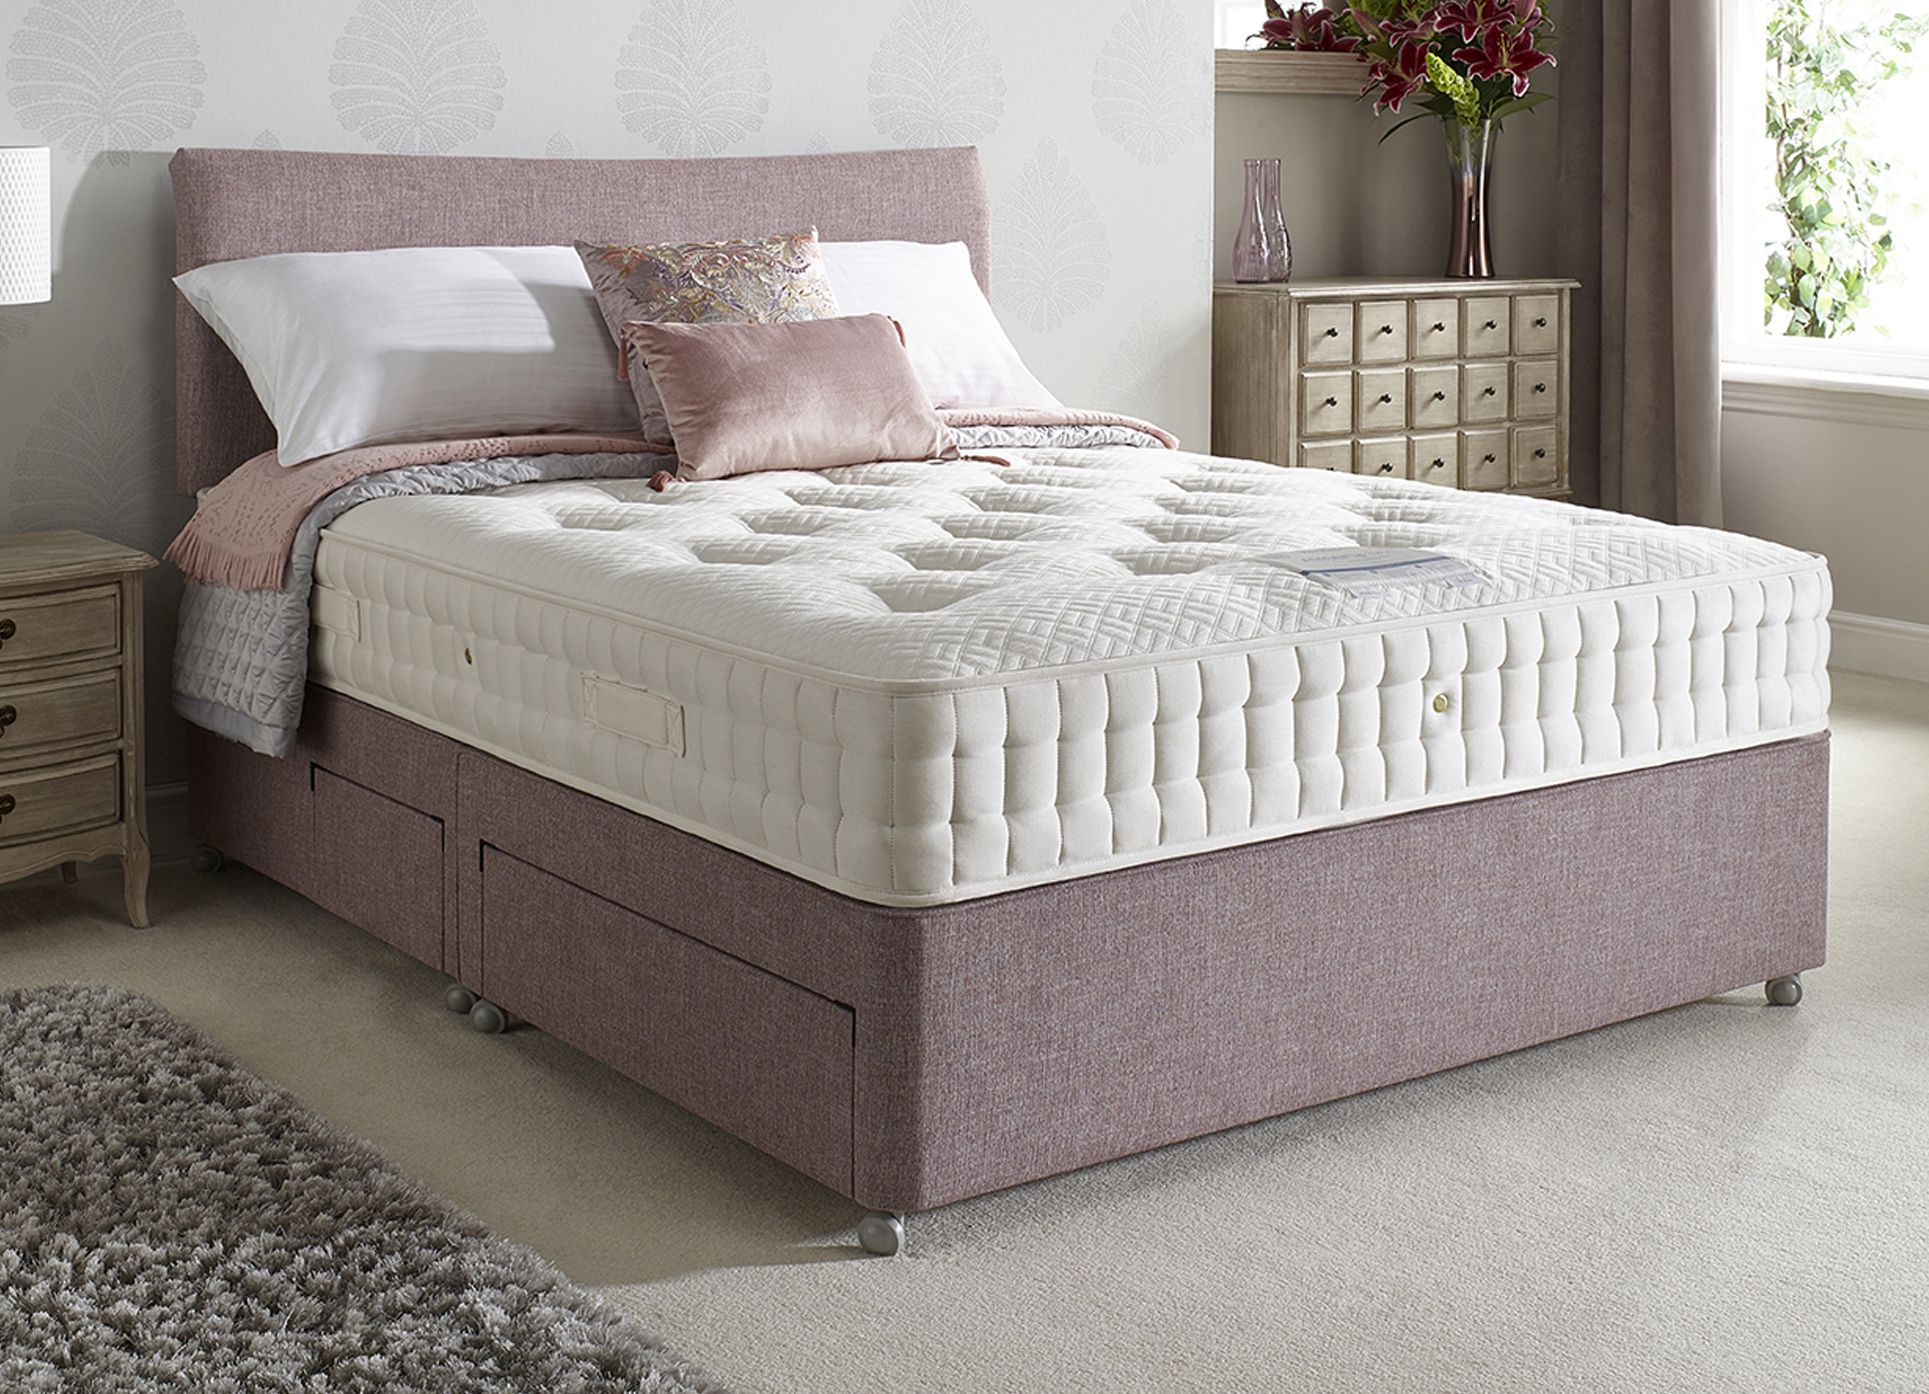 mattresses beds bedroom living homes